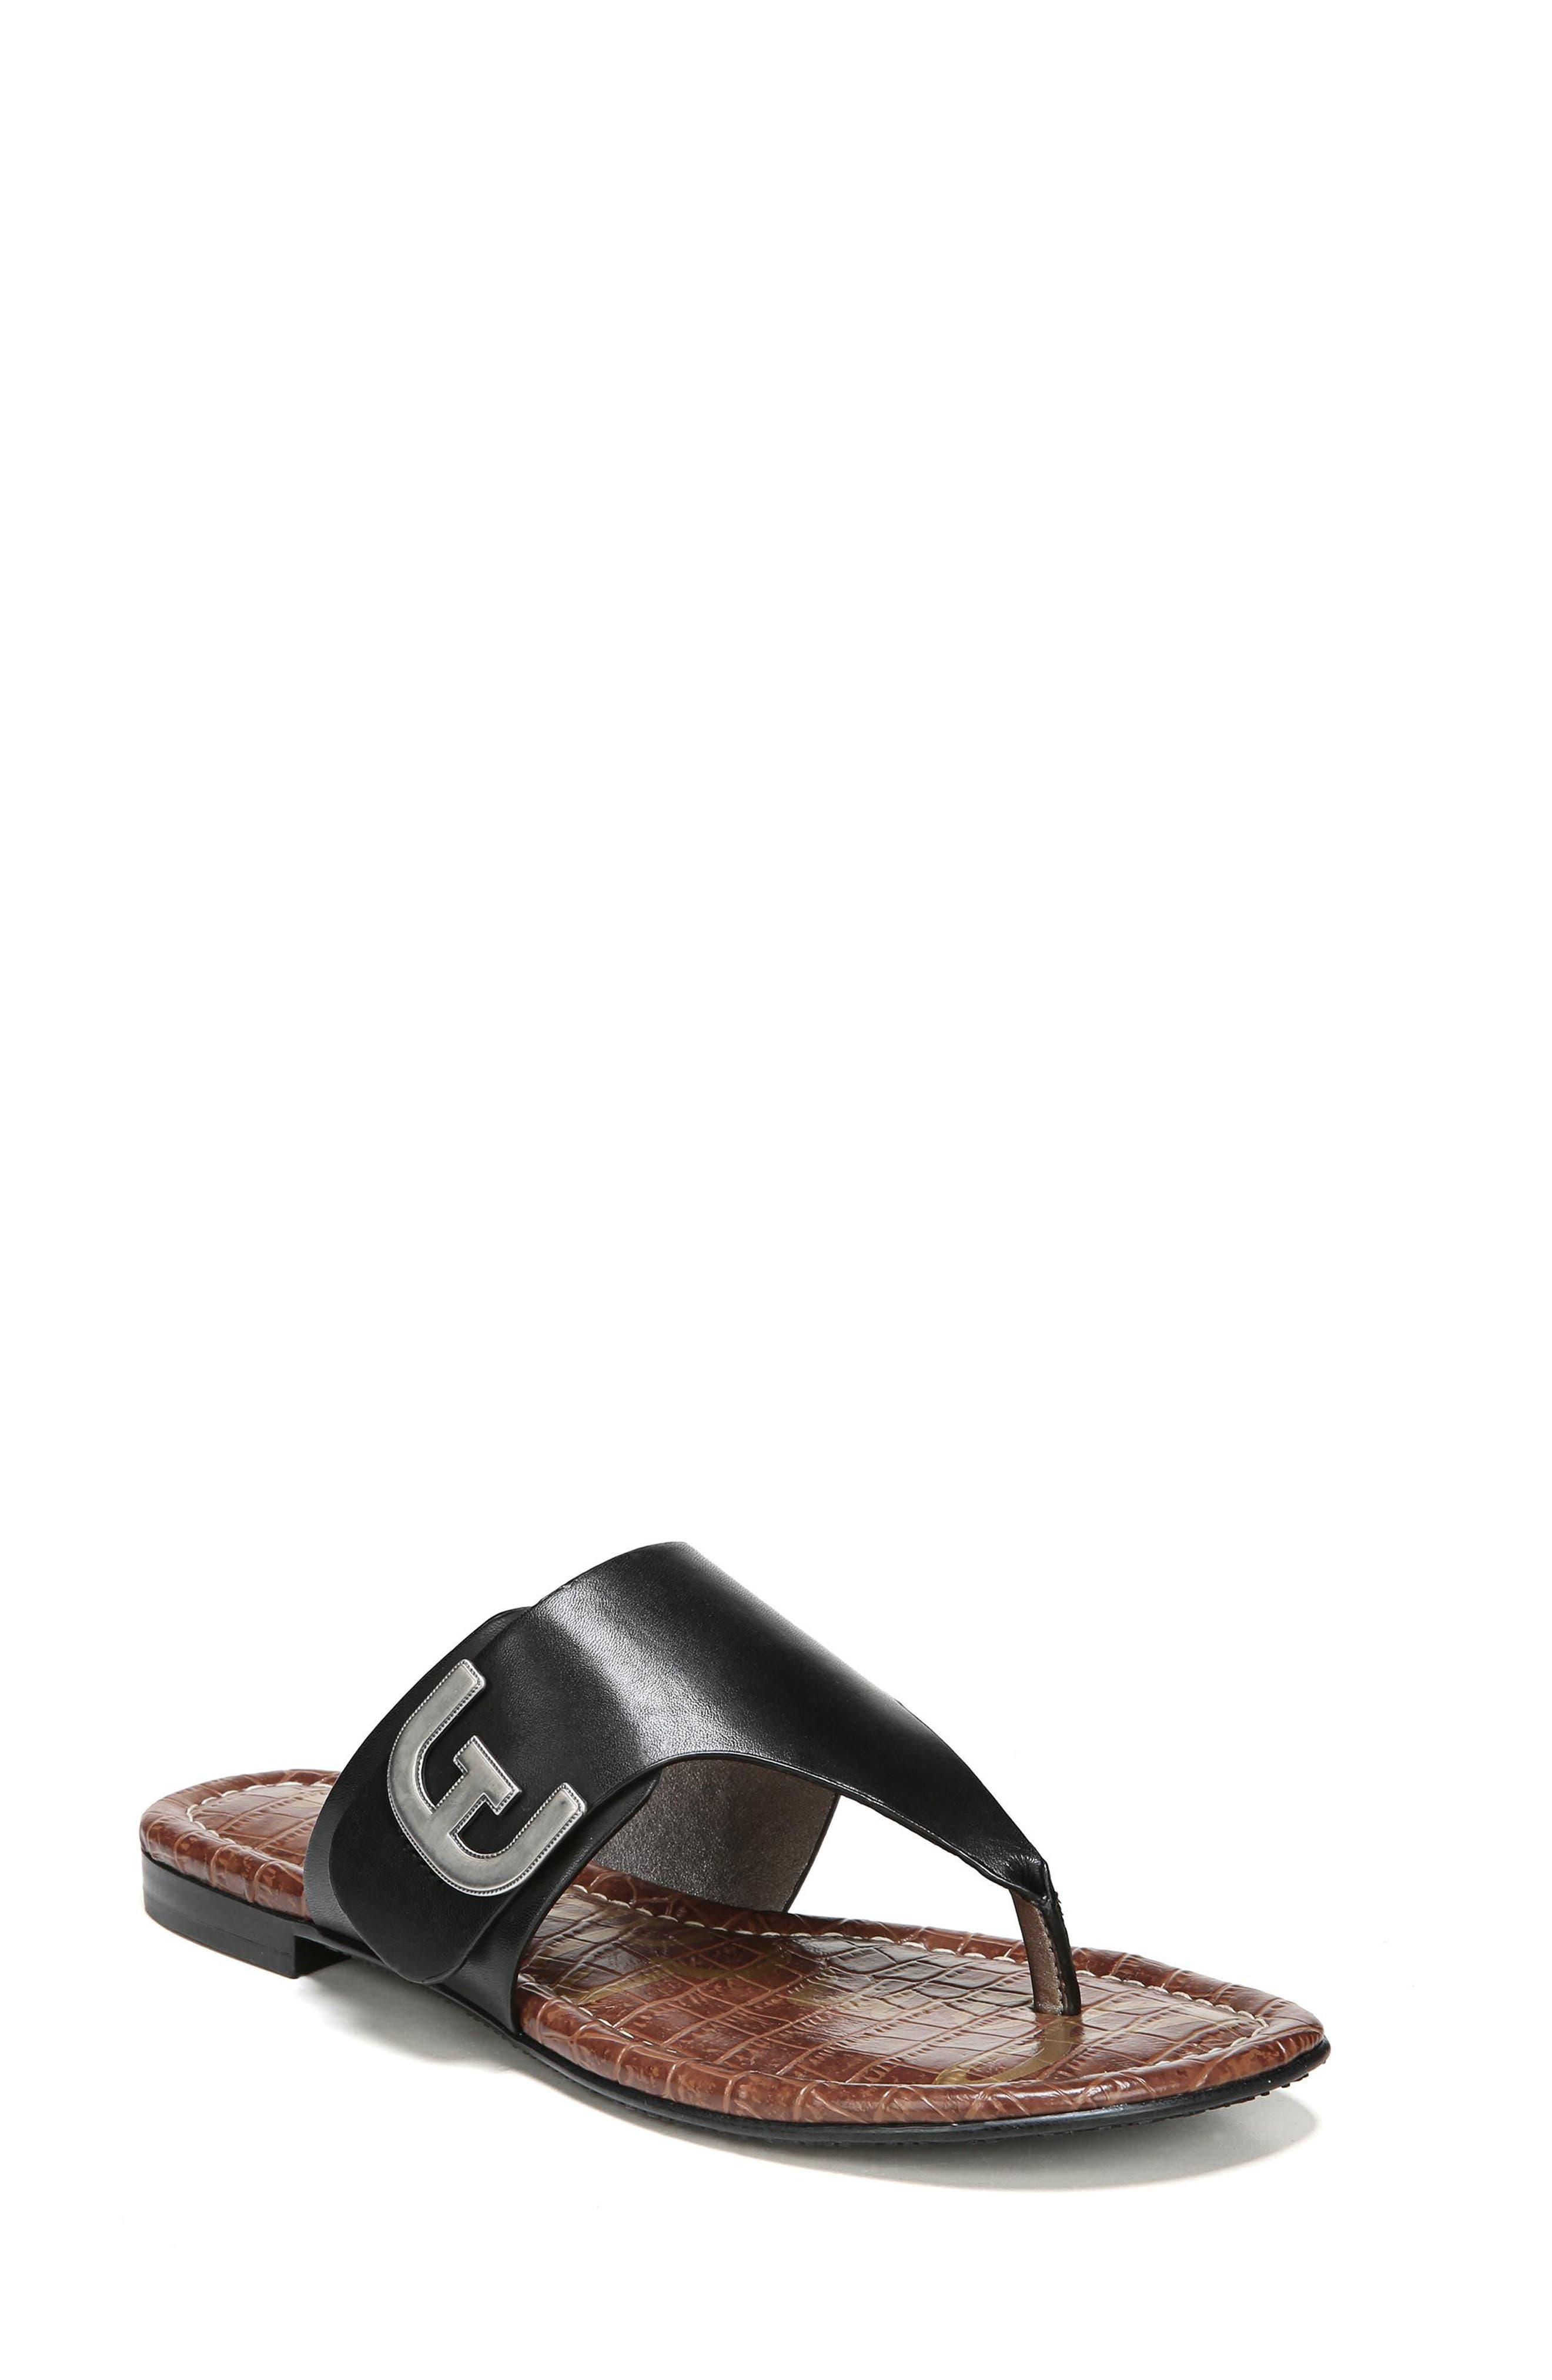 Barry V-Strap Thong Sandal,                             Main thumbnail 1, color,                             Black Leather